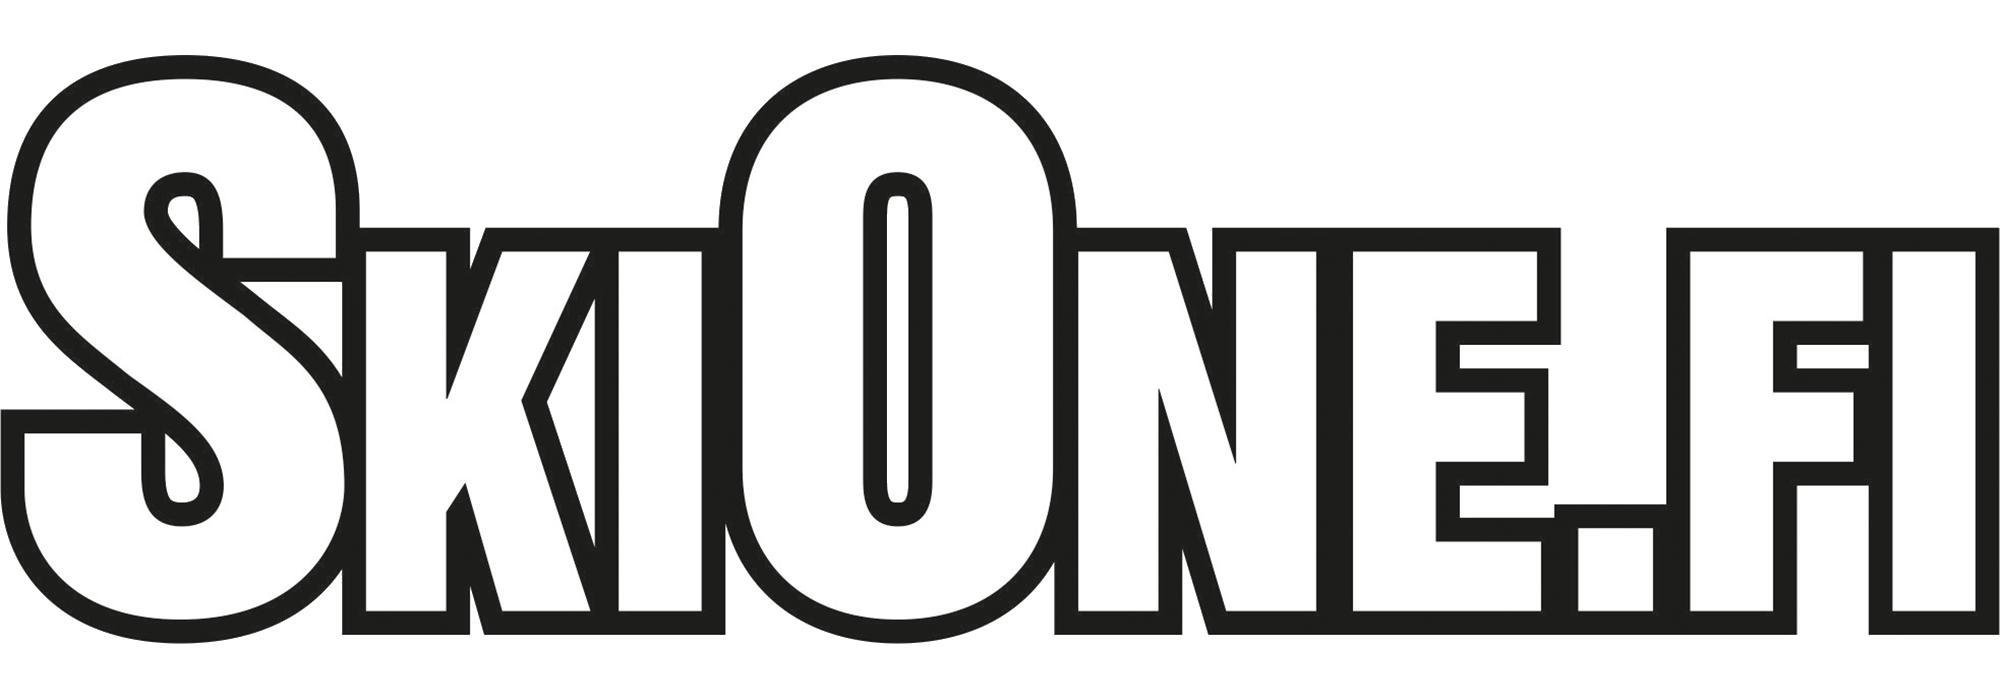 SkiOne Group